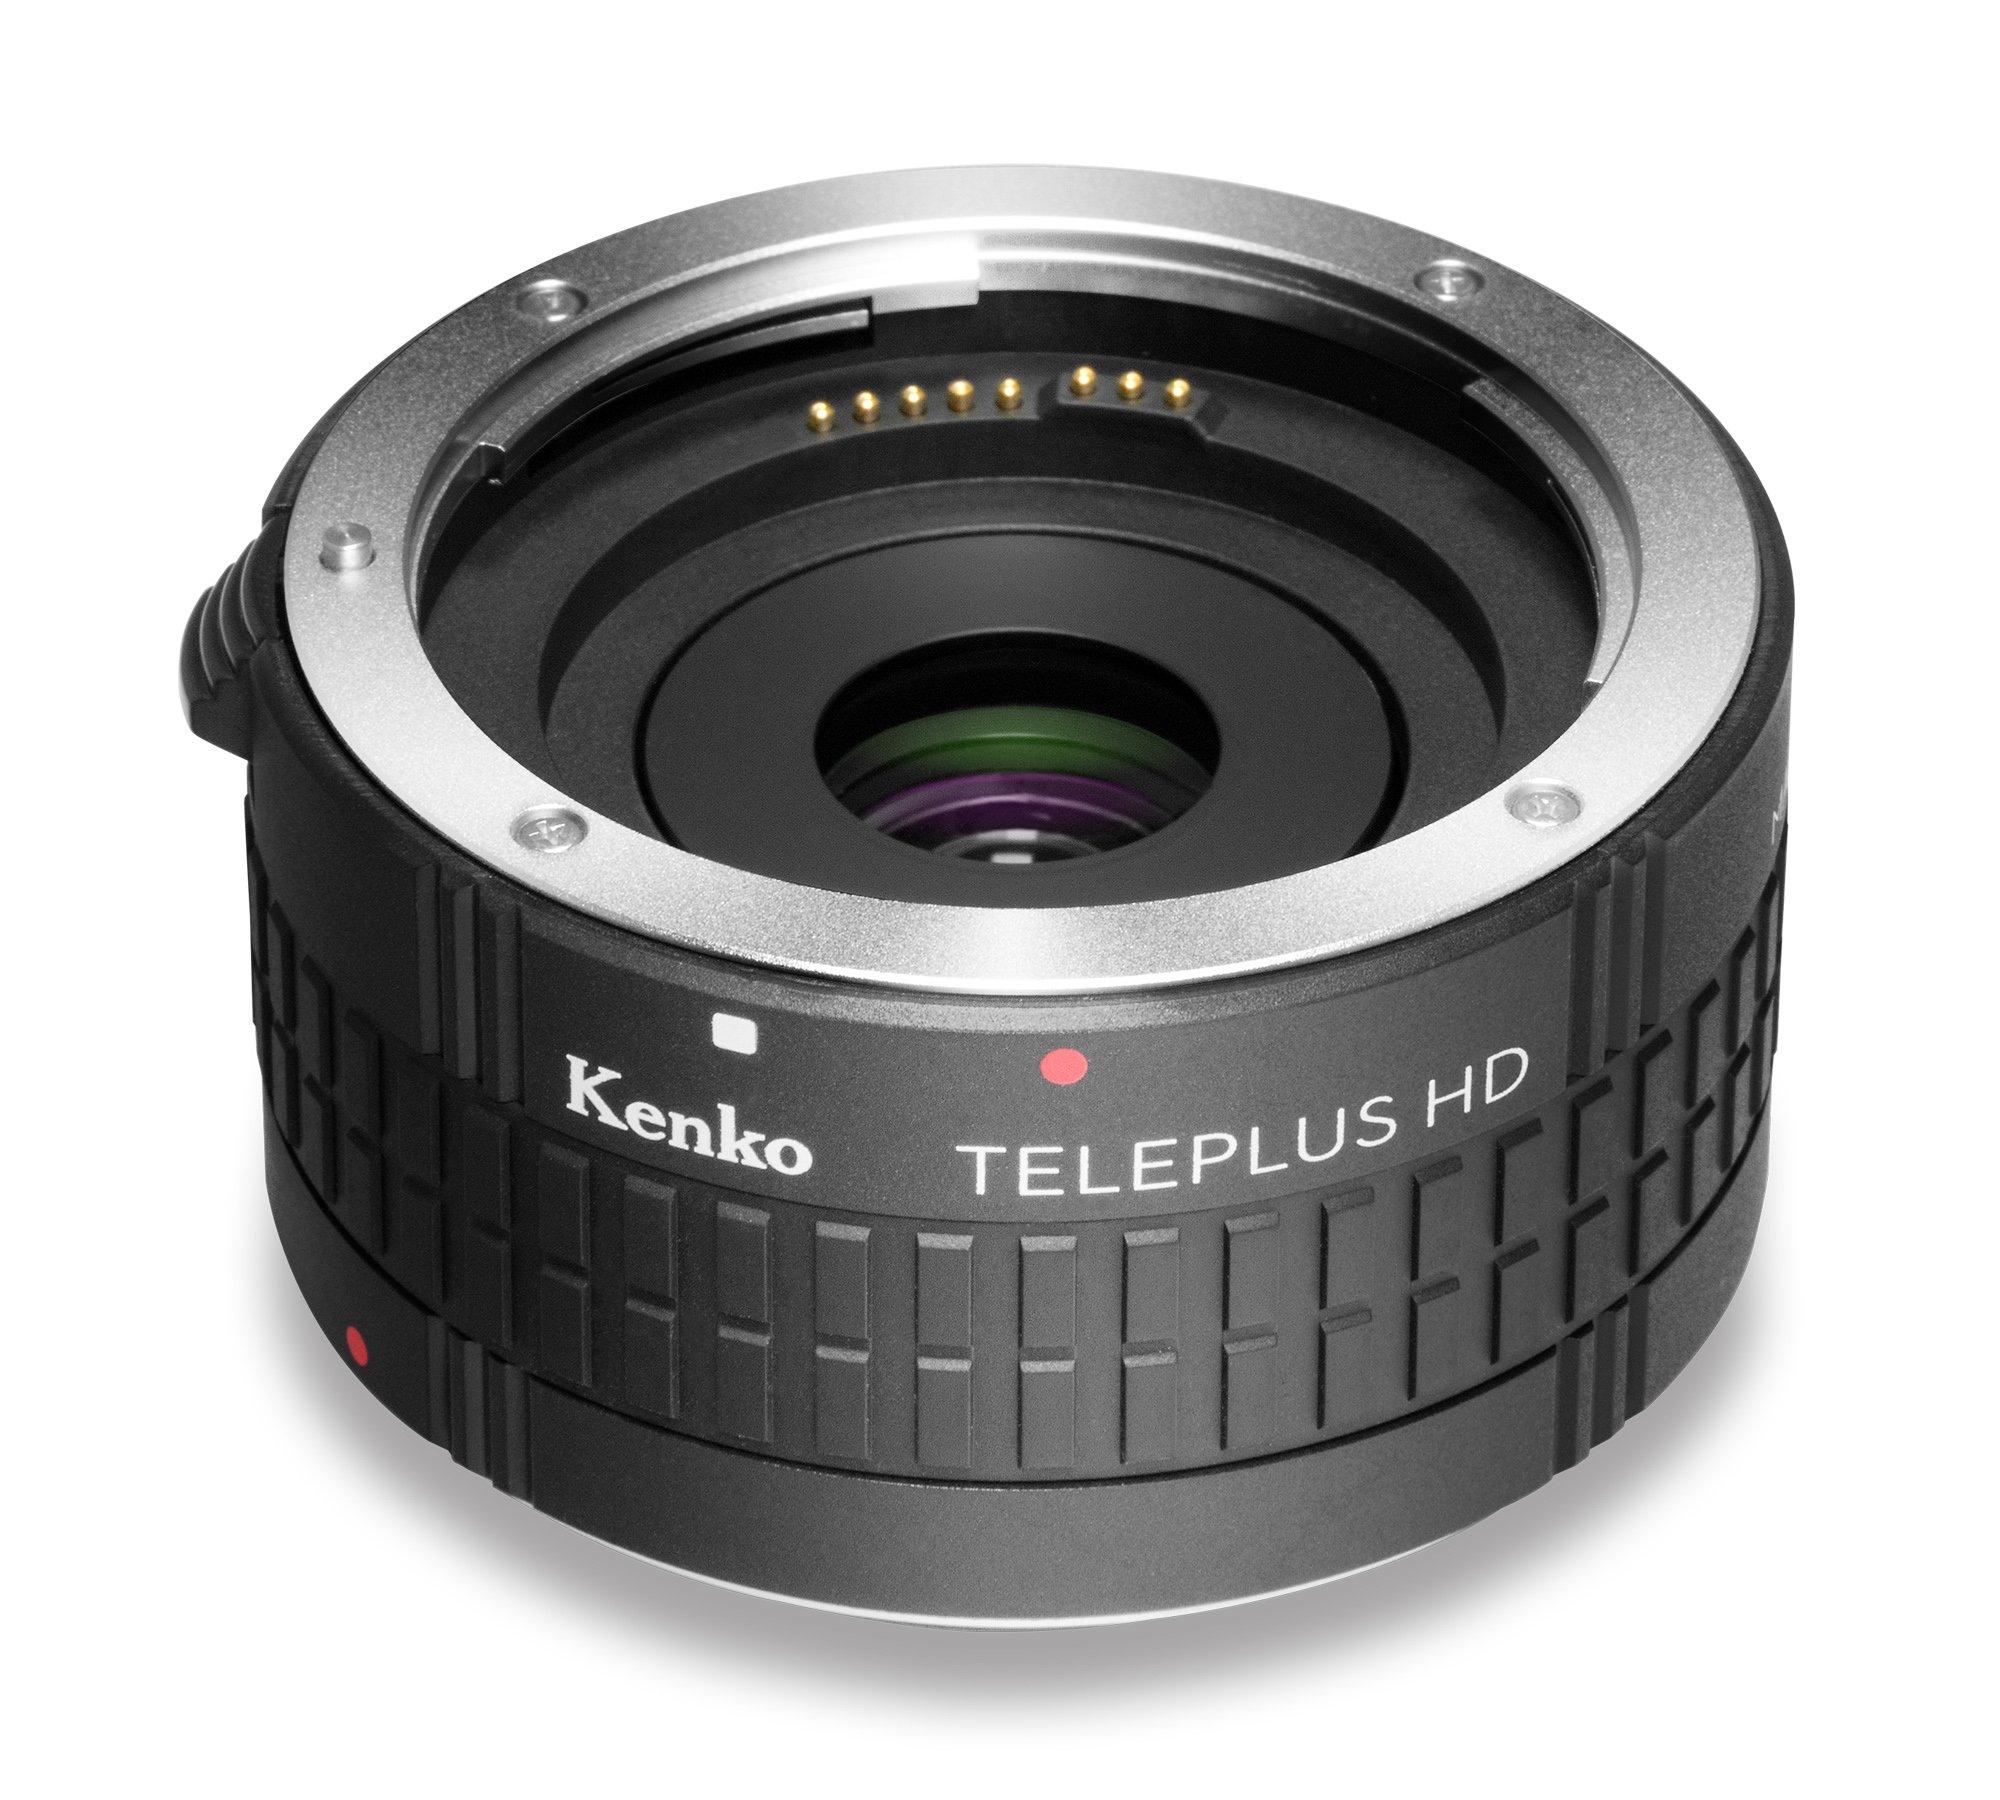 KENKO Telekonvertor 2x Teleplus HD DGX pro Canon